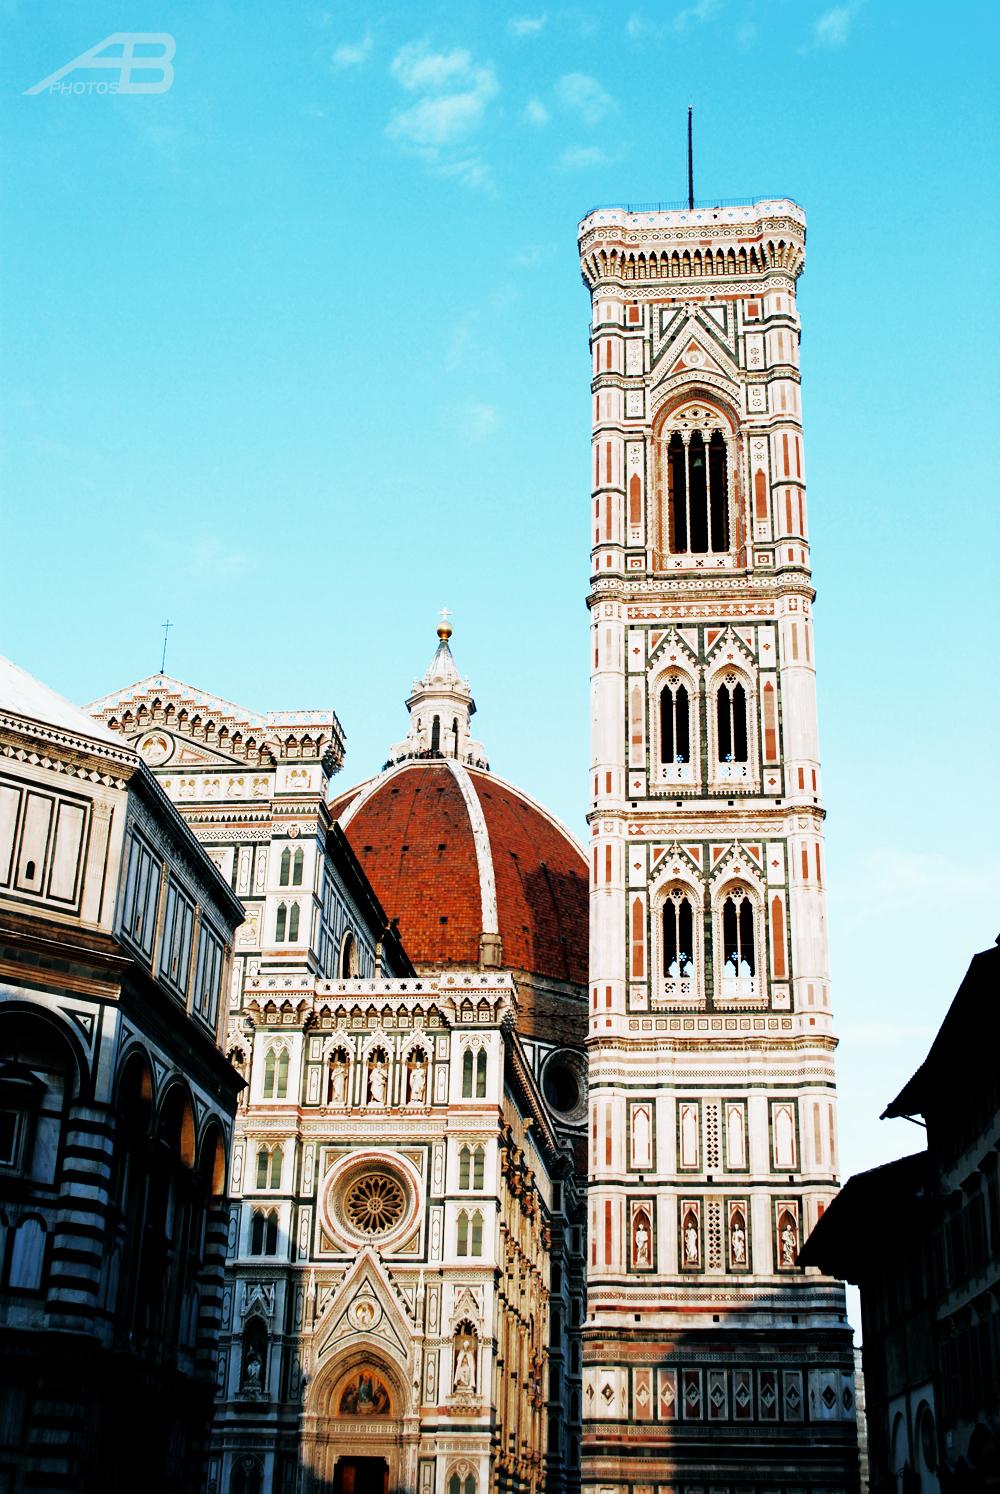 Duomo di Firenze, Italy